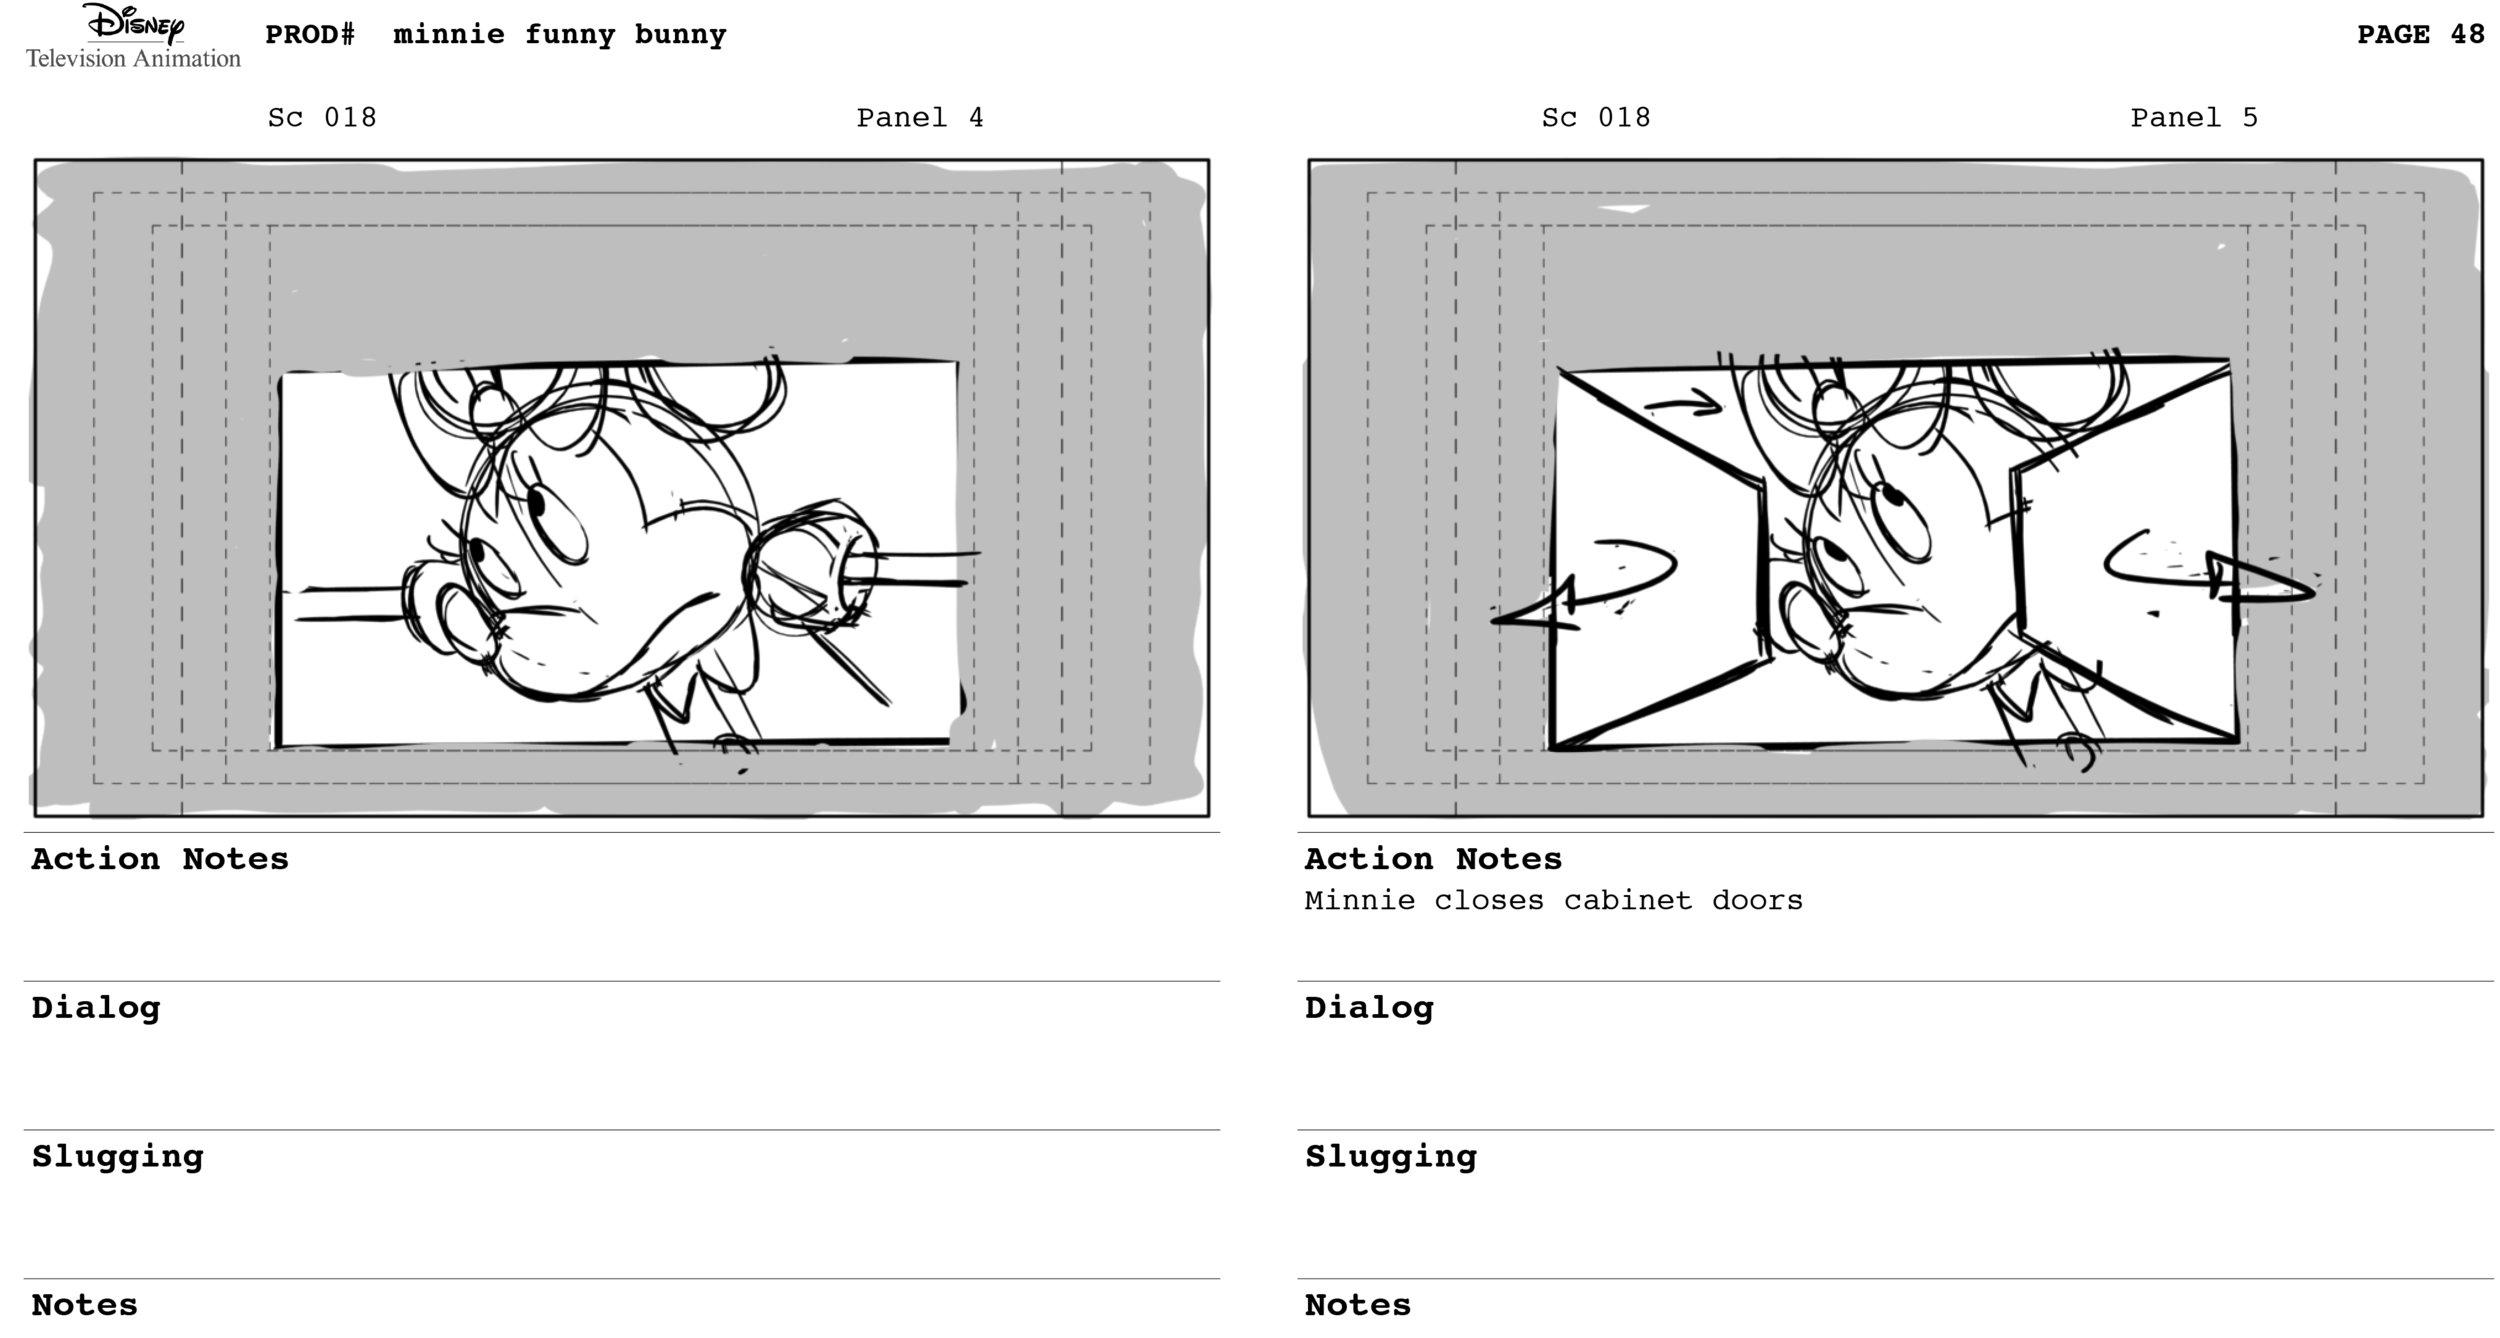 Funny_Bunny-49.jpg